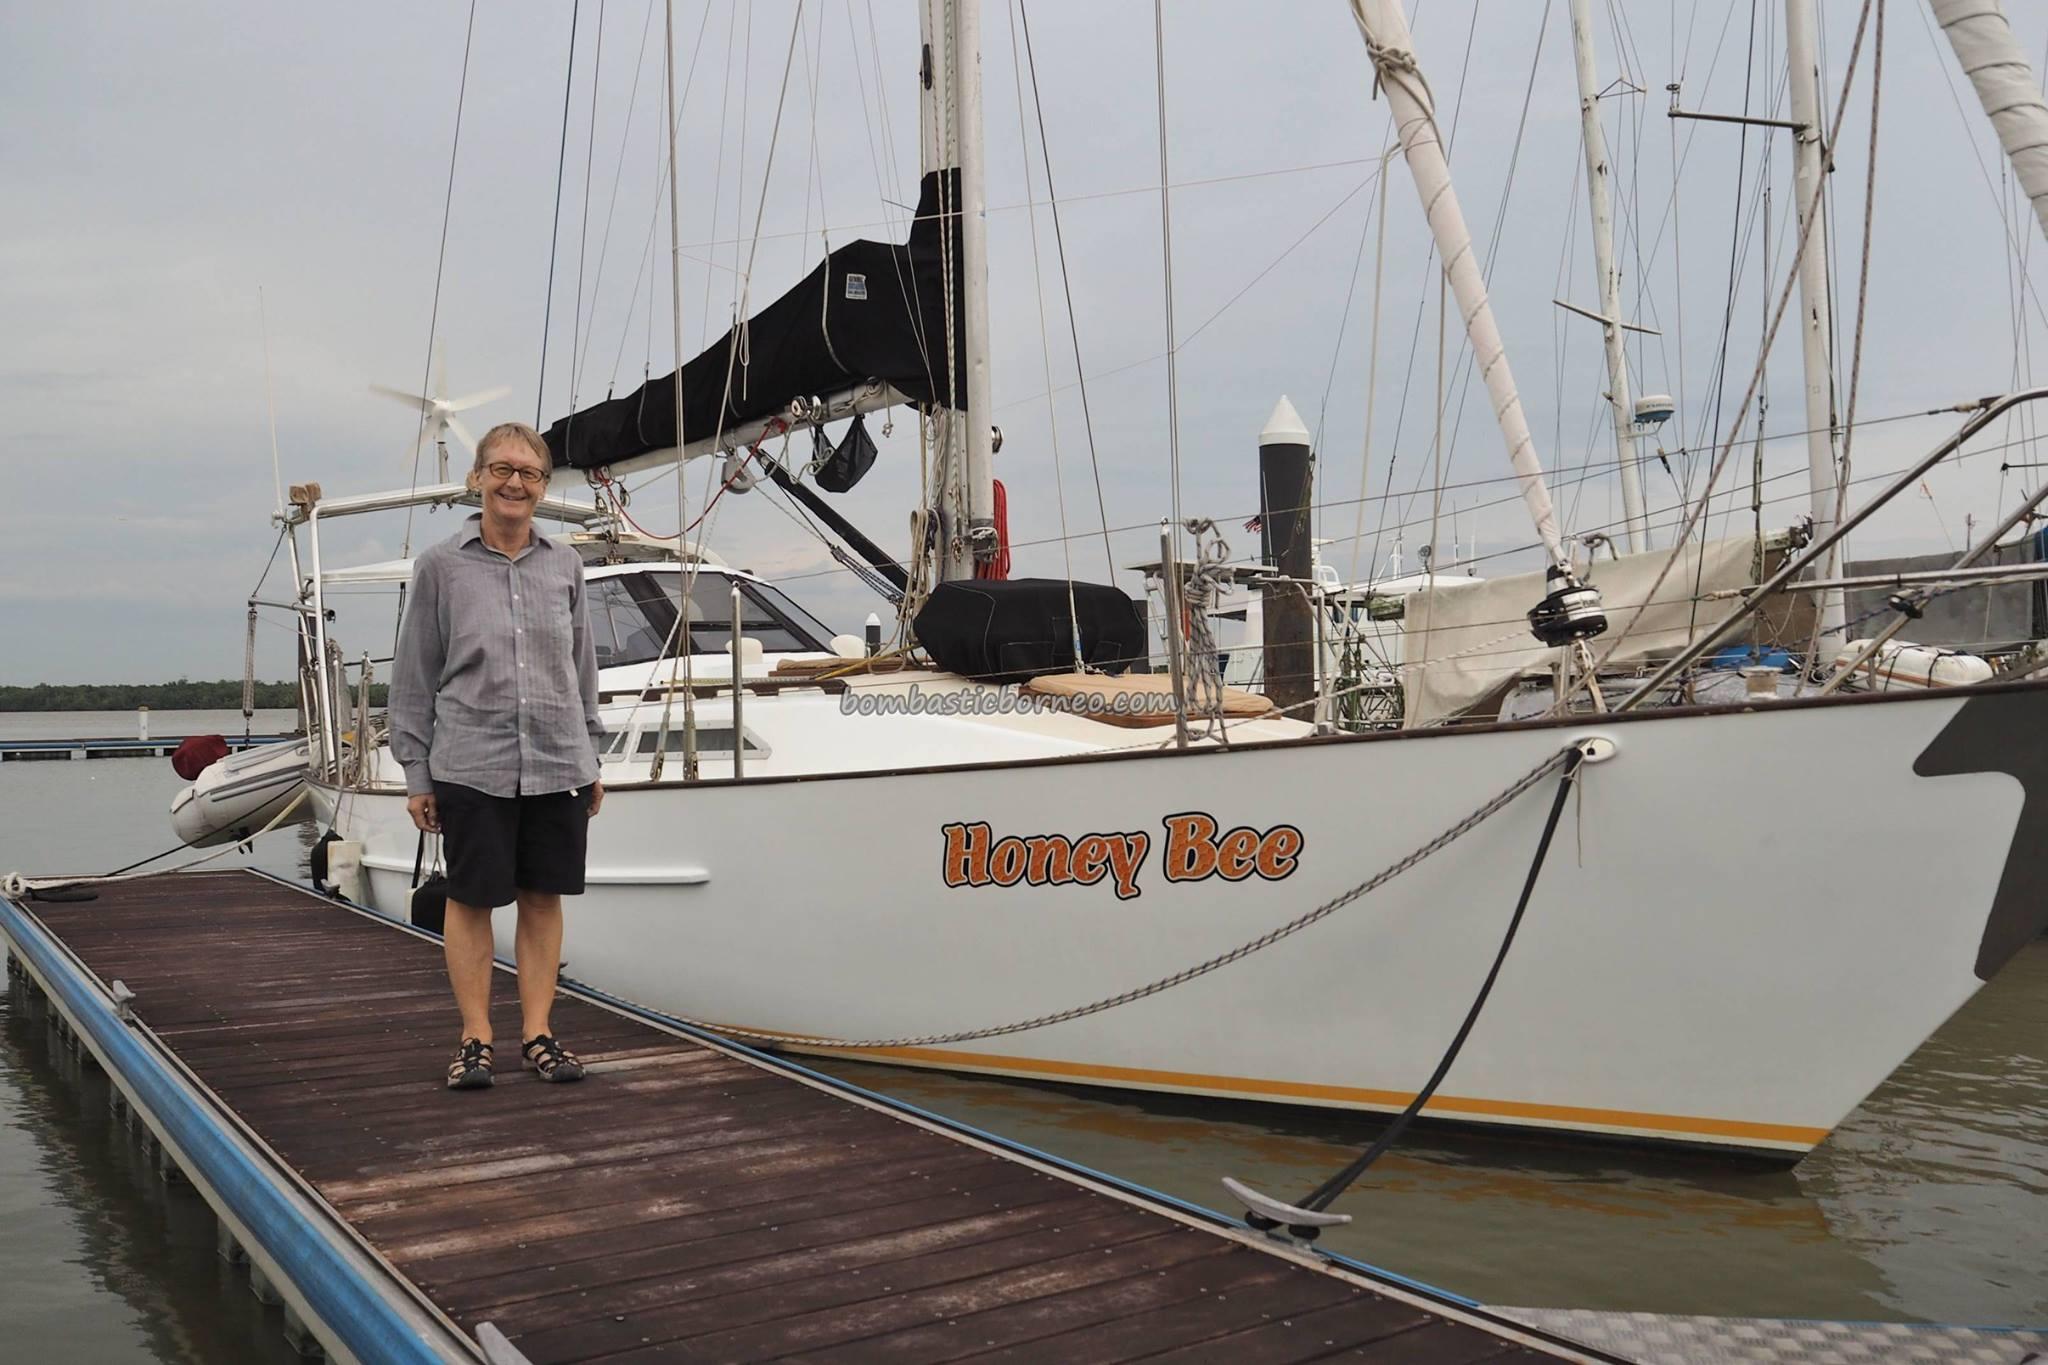 Jabatan Laut Wilayah Sarawak, Marina Kuching, Sailing Boat, Sarawak Marine Department,